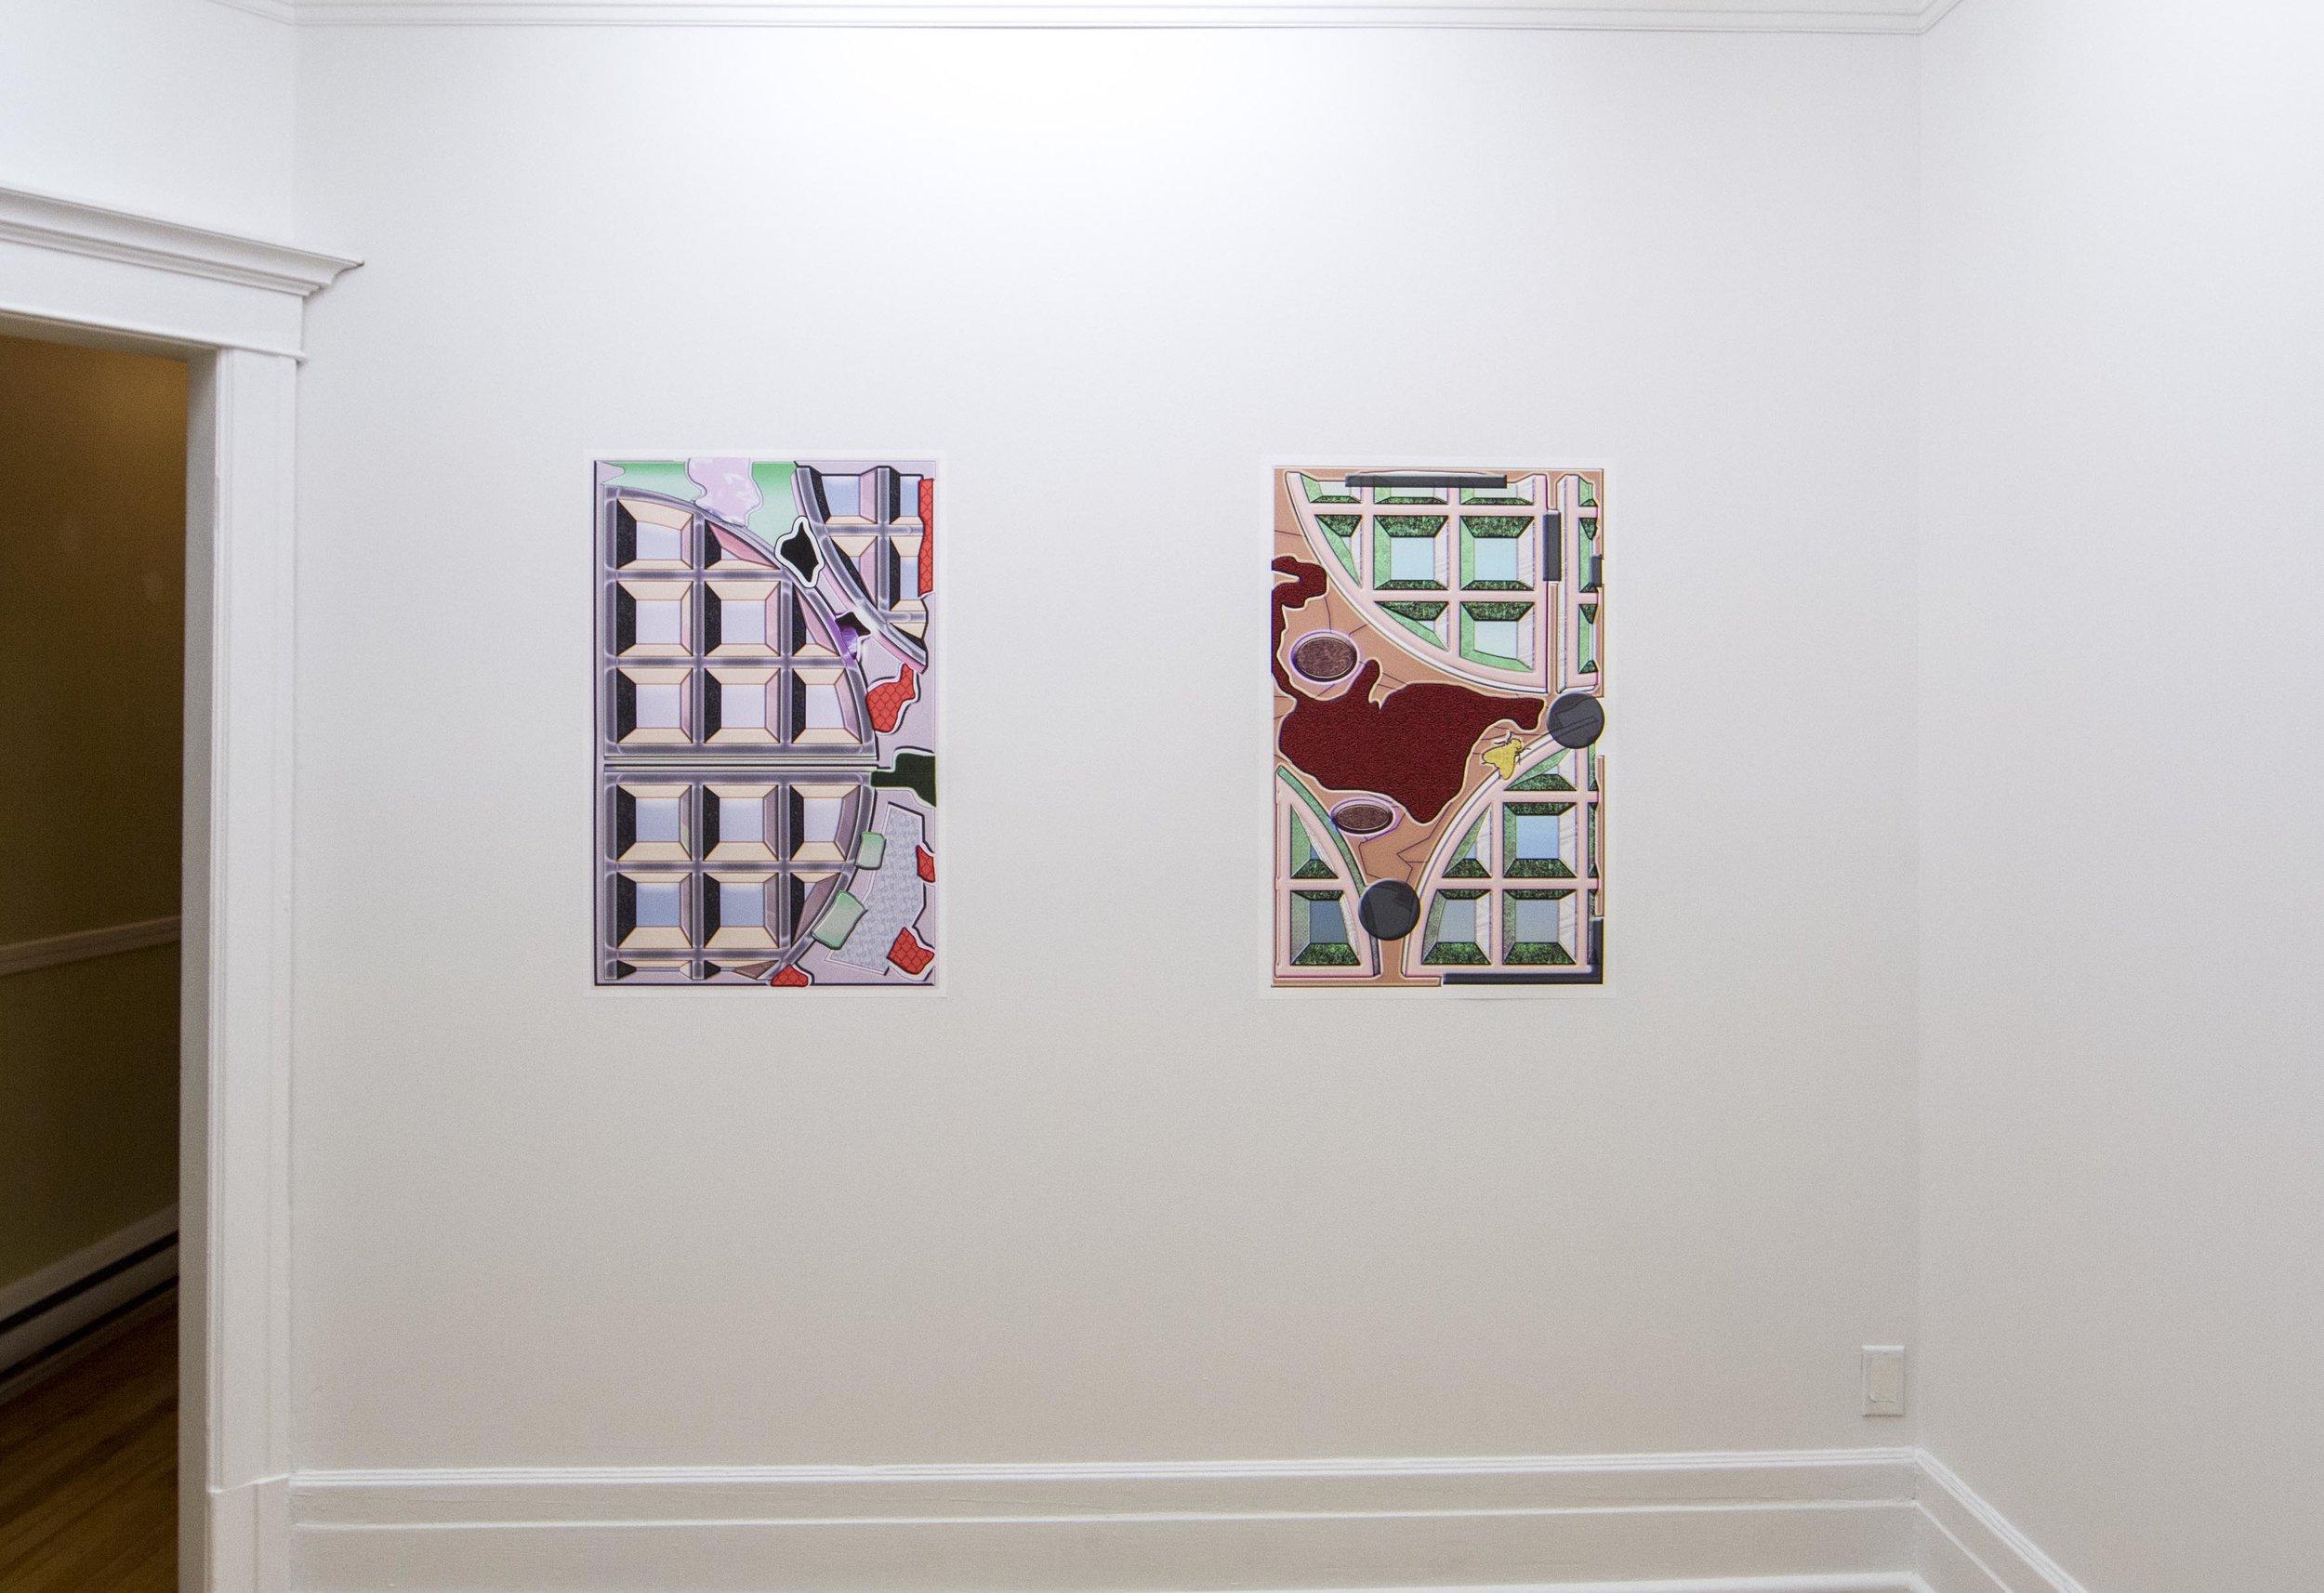 Shoegaze (version 1)  (Left),  Shoegaze (version 2)  (right), digital print on polybanniere paper, 2015.